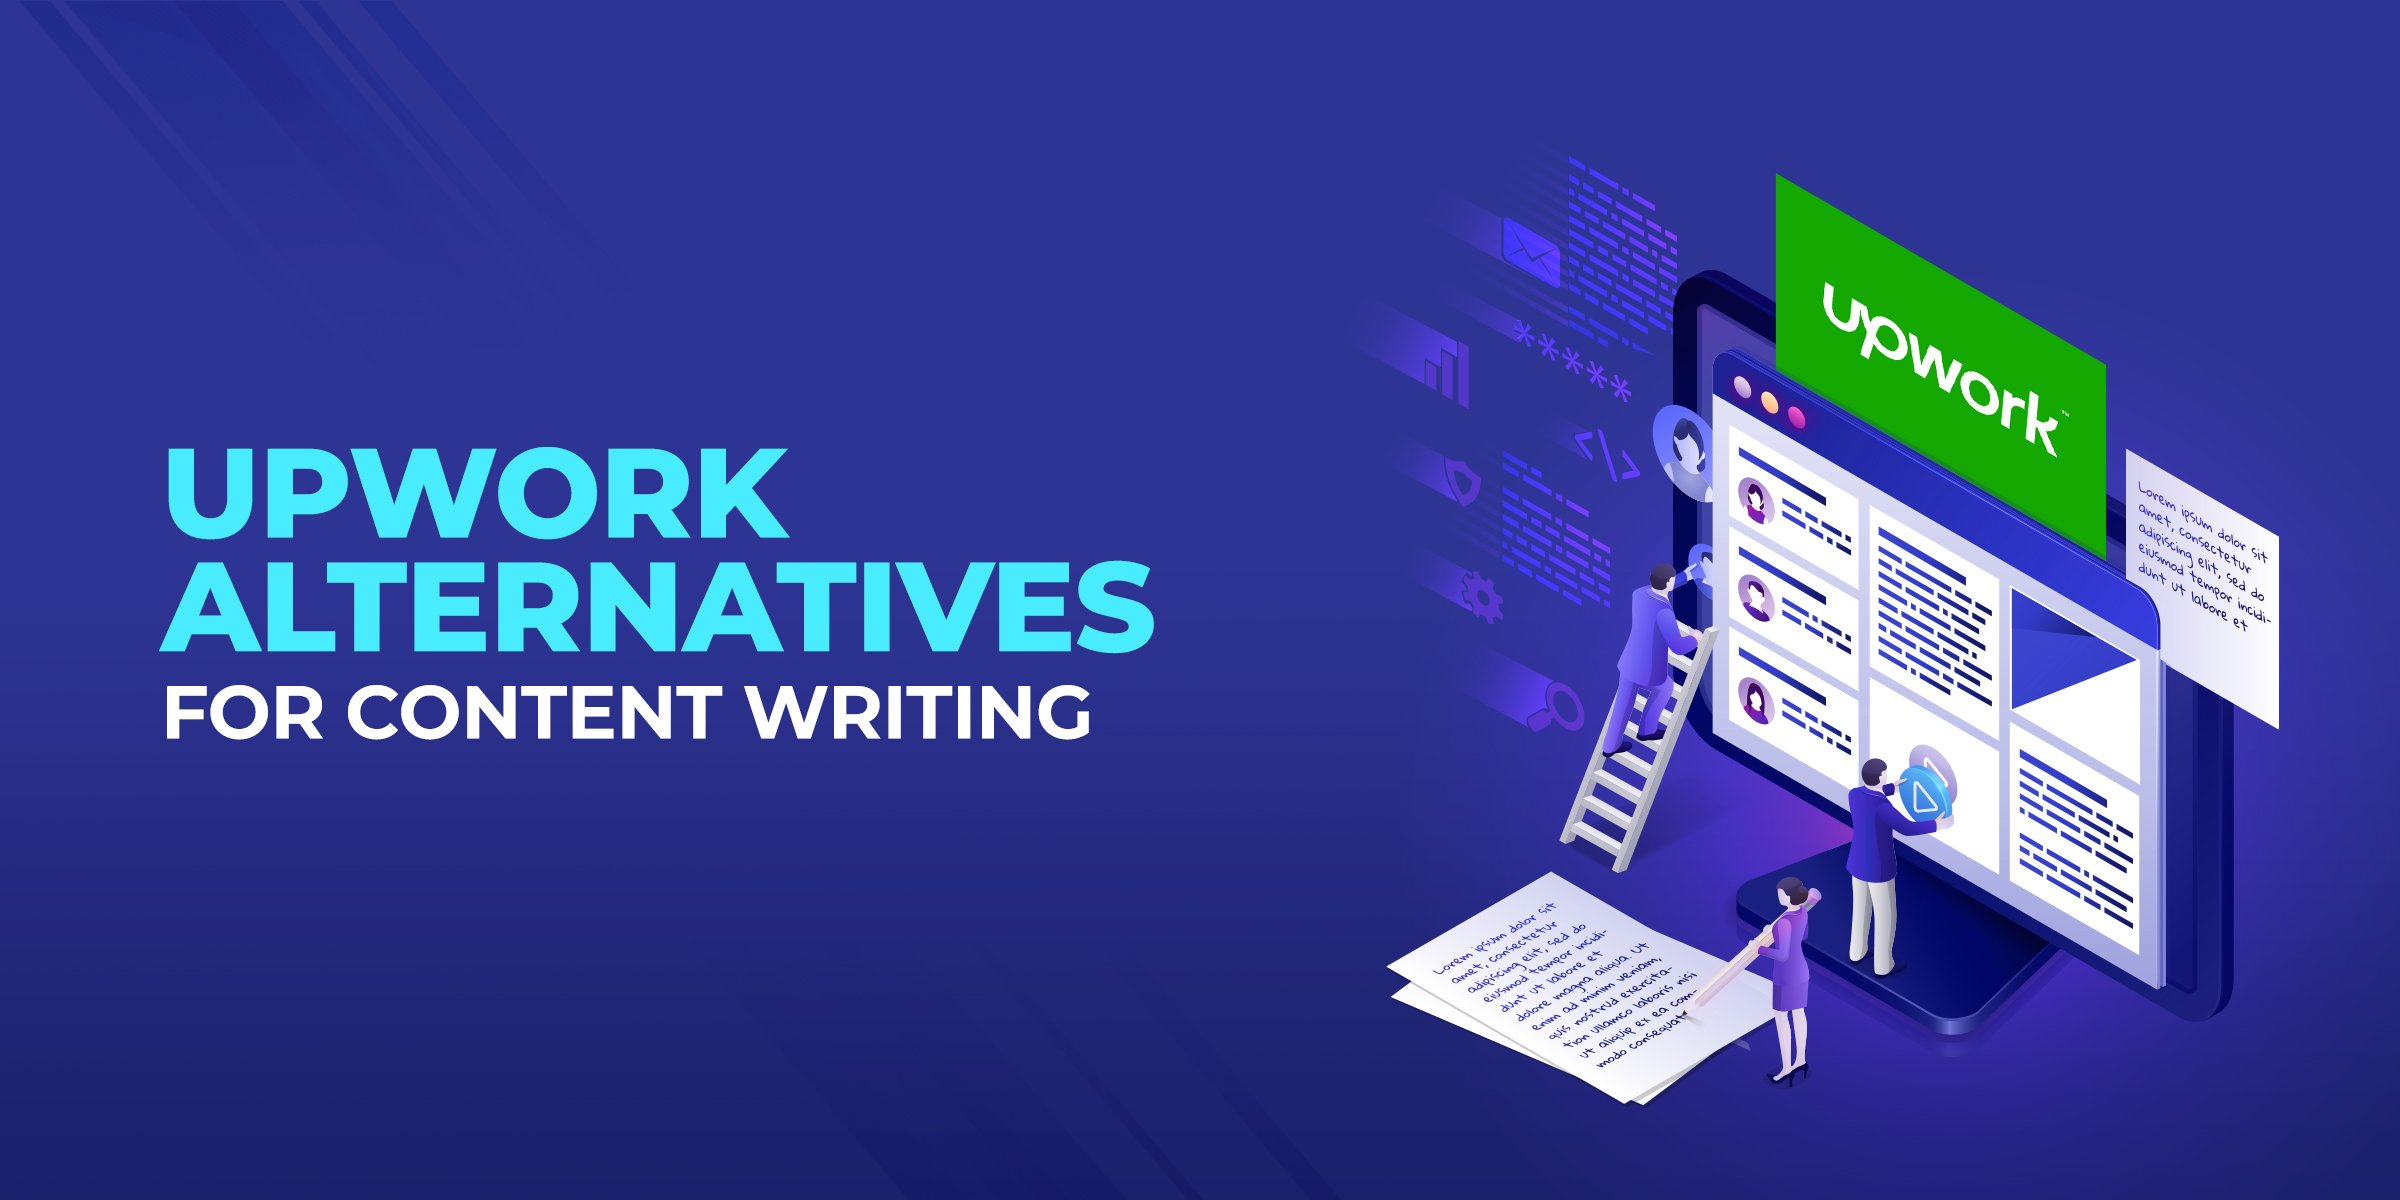 Upwork Alternatives for Content Writing